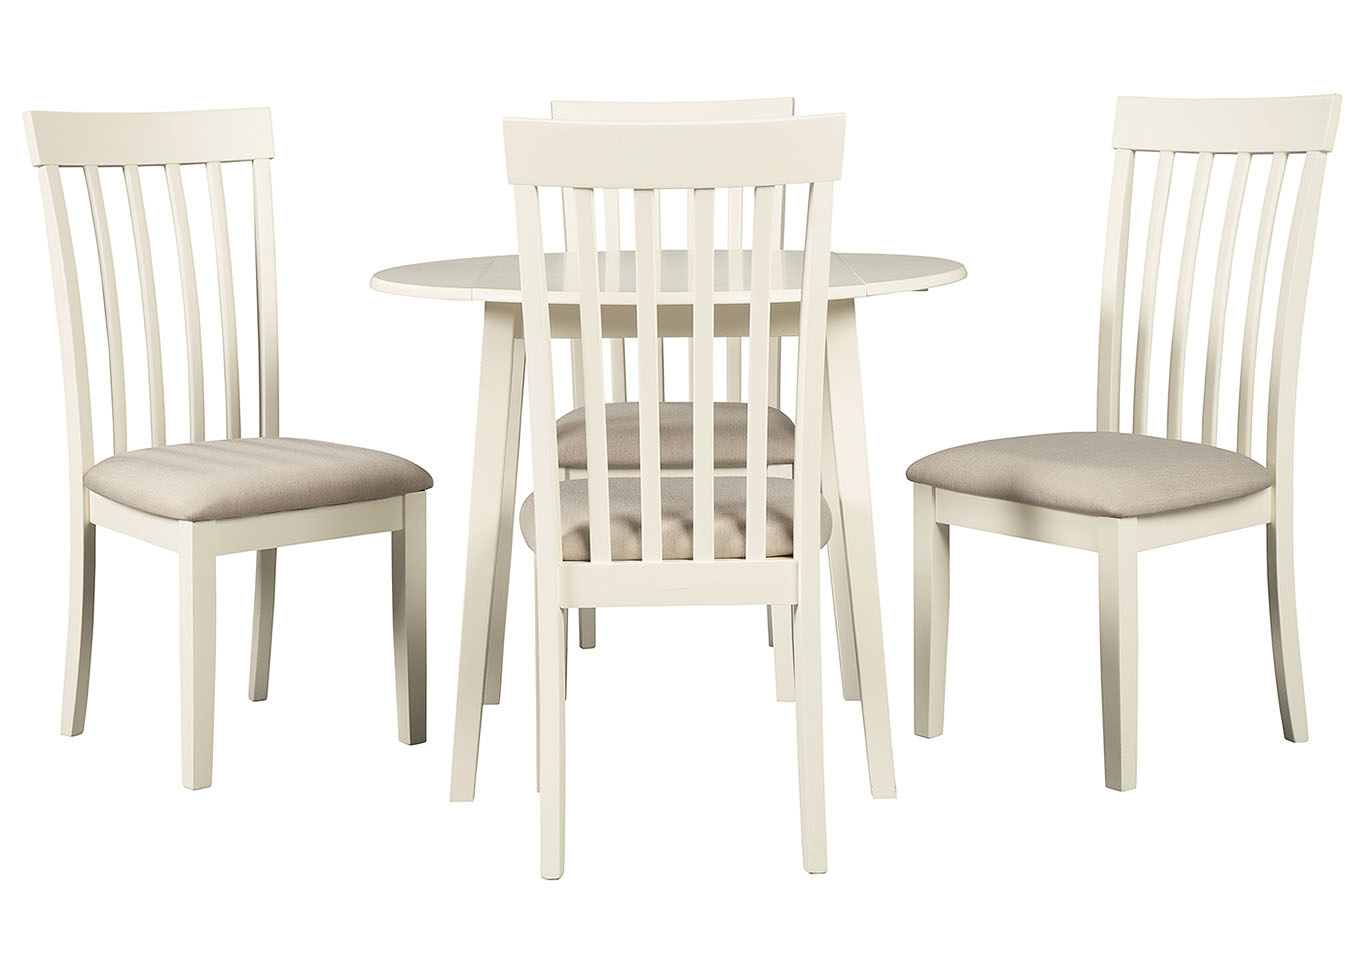 Brilliant Long Furniture Rainbow City Al Slannery White Dining Machost Co Dining Chair Design Ideas Machostcouk